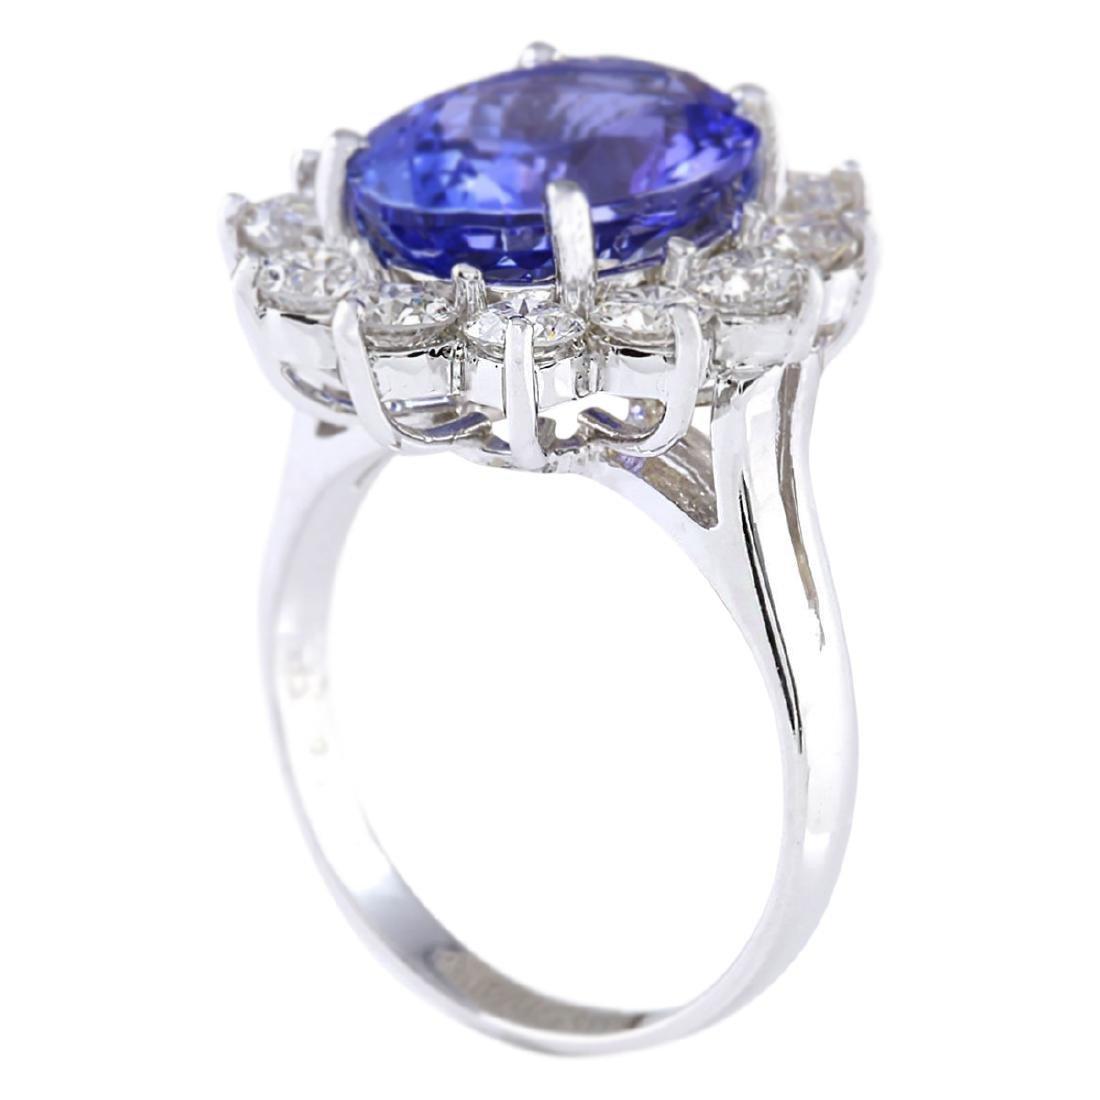 6.78 CTW Natural Blue Tanzanite And Diamond Ring 18K - 3